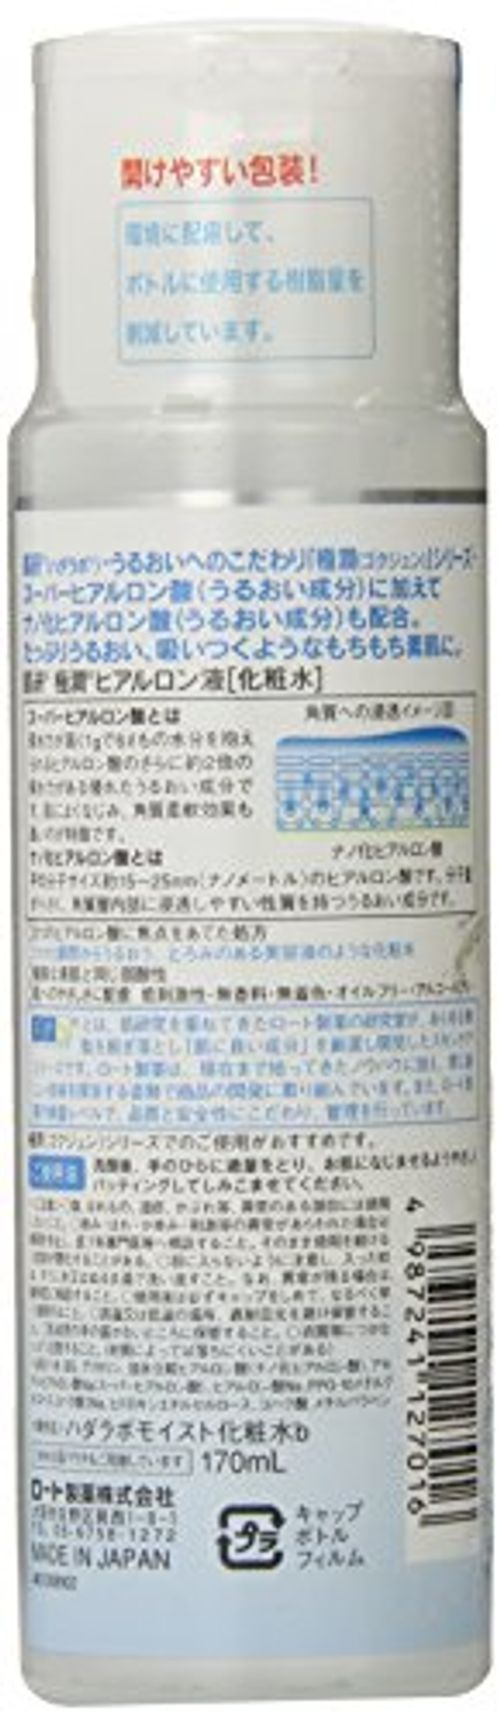 photo Wallpaper of Hada Labo-Hada Labo Rohto Hadalabo Gokujun Hyaluronic Lotion Moist, 5.7 Fl. Oz.-